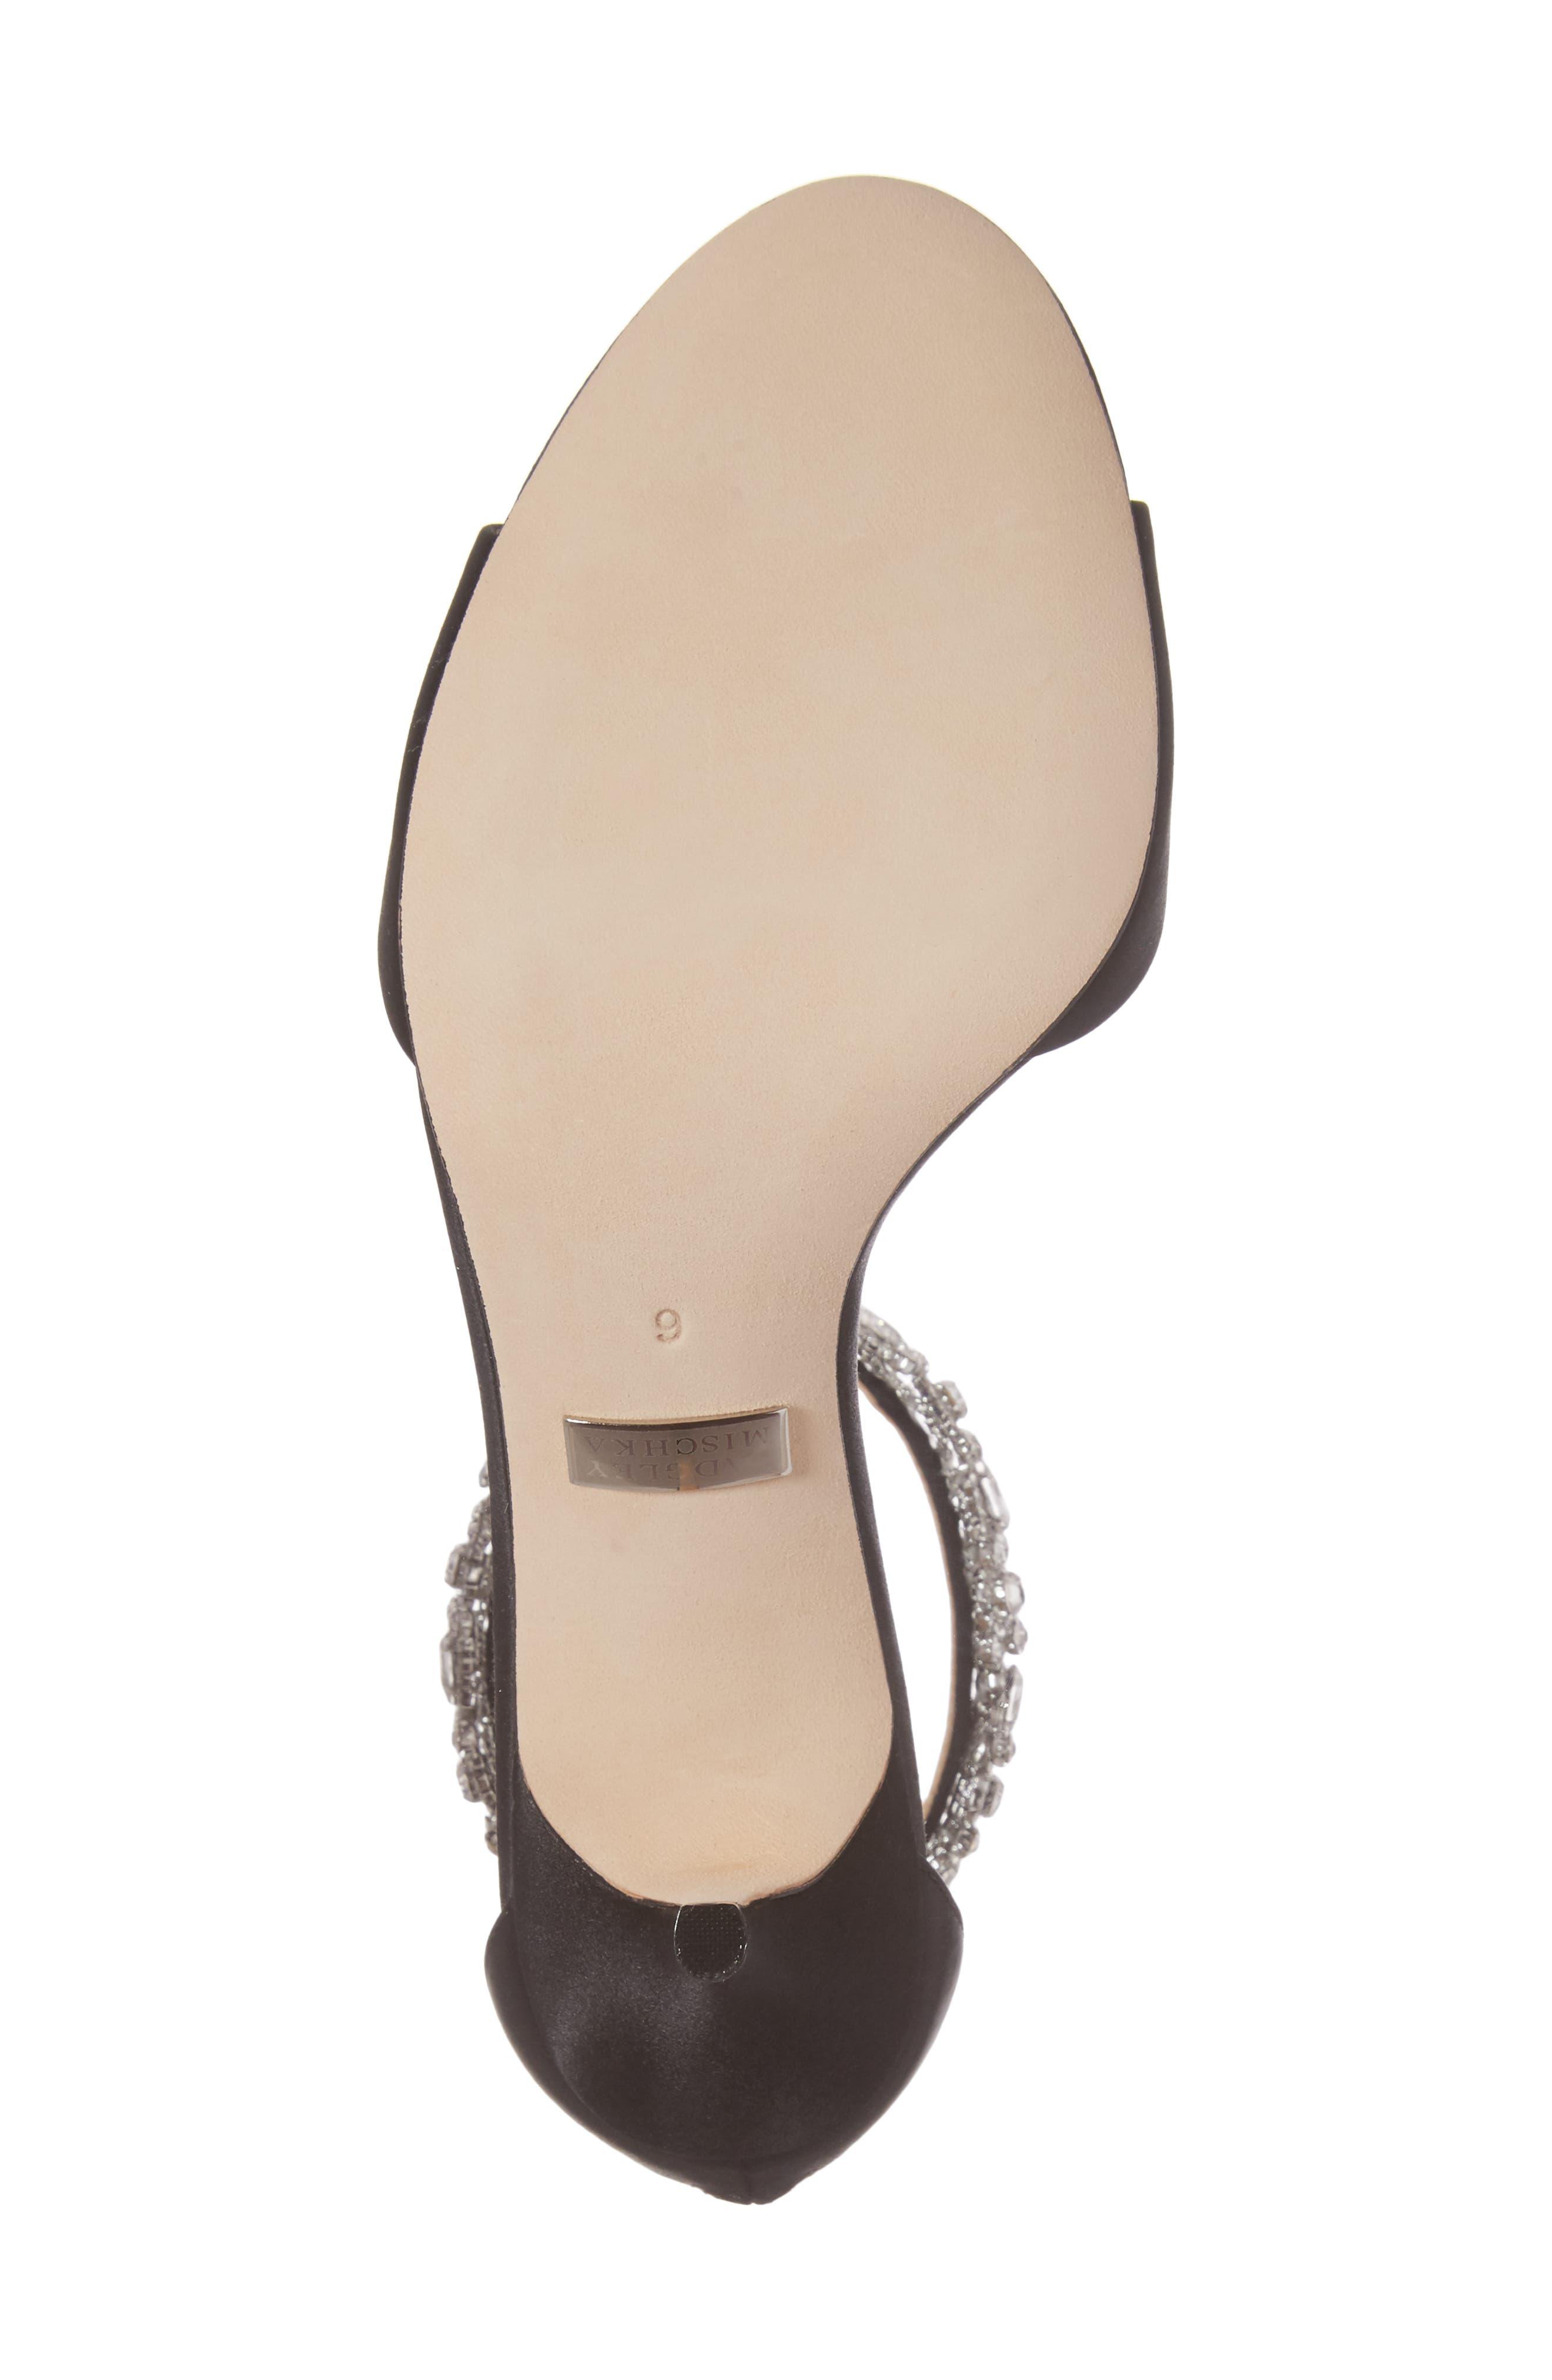 Geranium Embellished Sandal,                             Alternate thumbnail 6, color,                             015